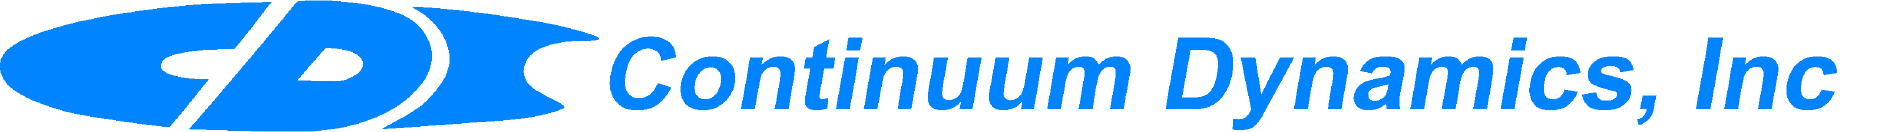 Continuum Dynamics, Inc